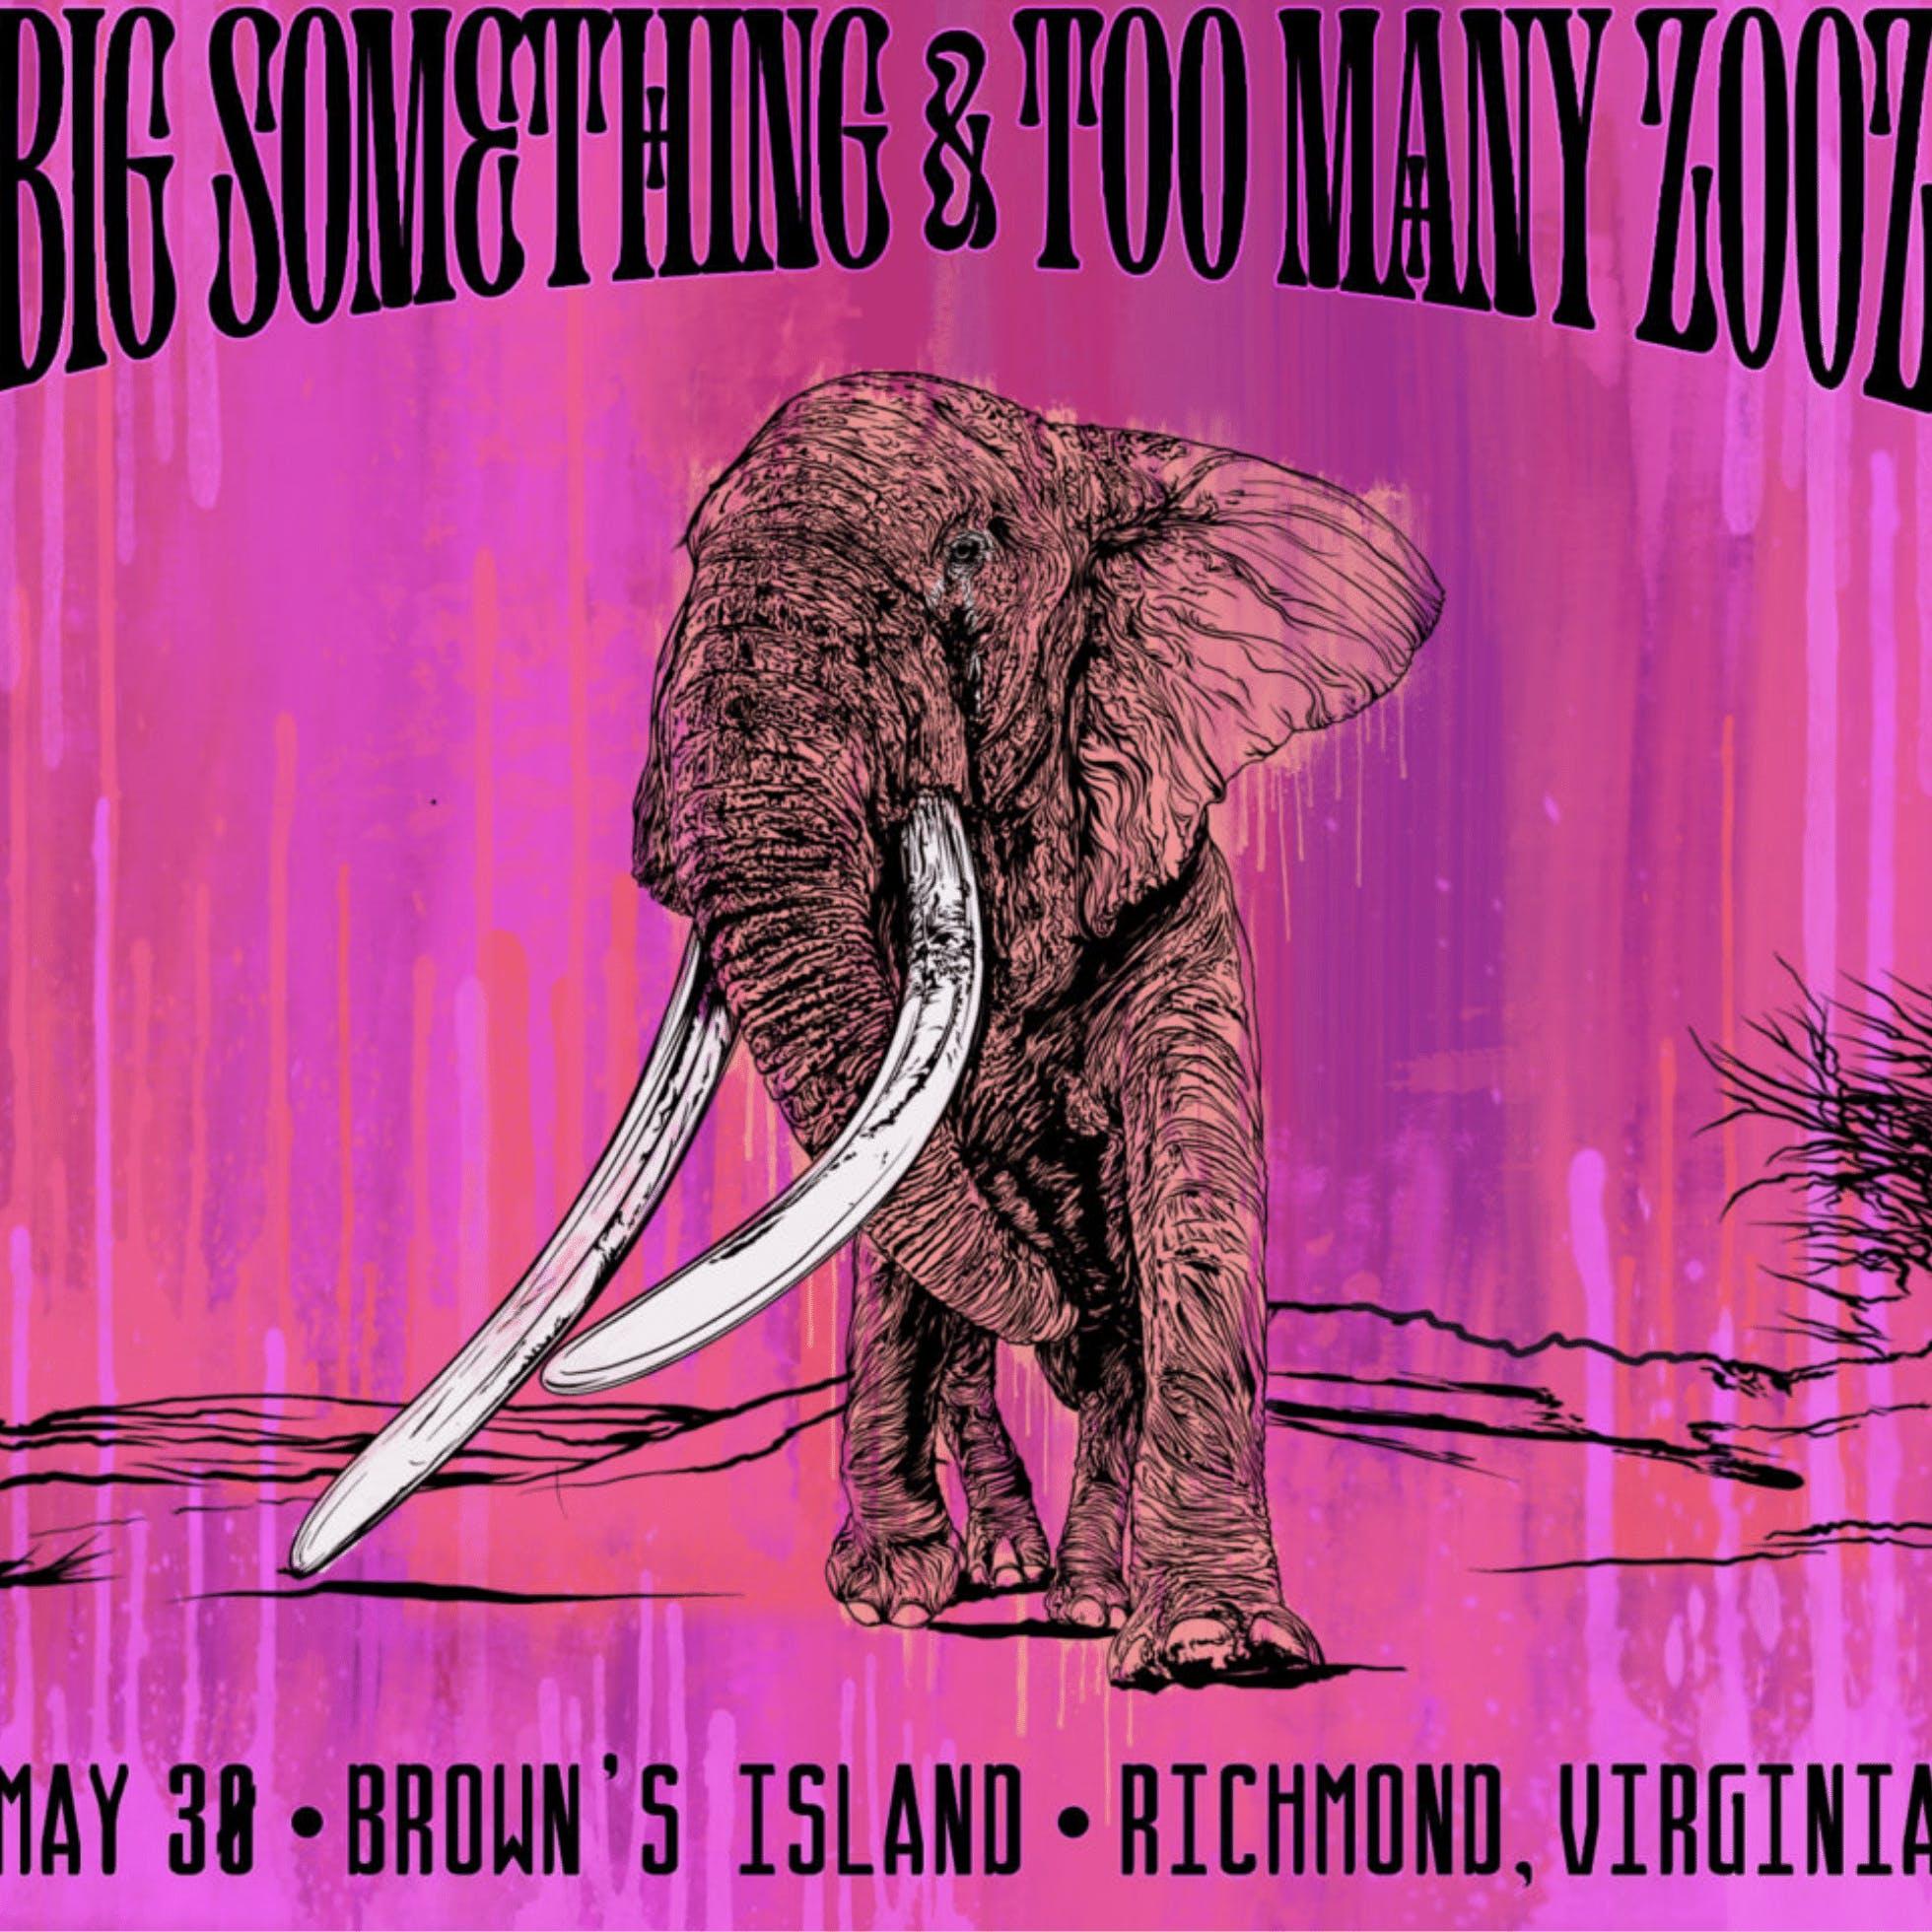 Big Something & Too Many Zooz at Brown's Island